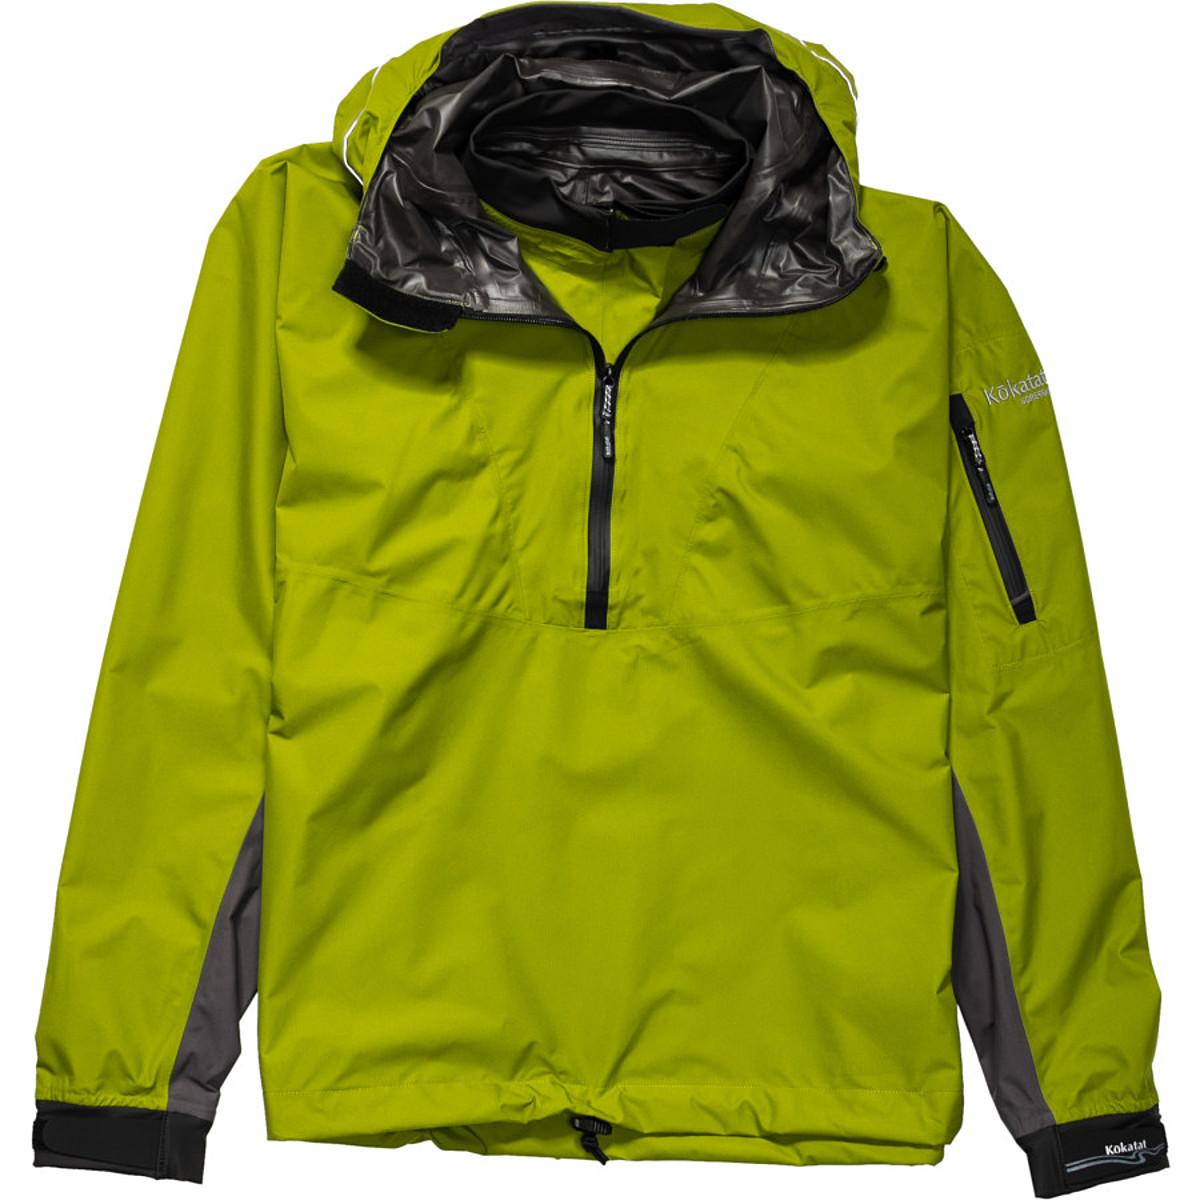 Kokatat Gore-Tex Pullover Jacket